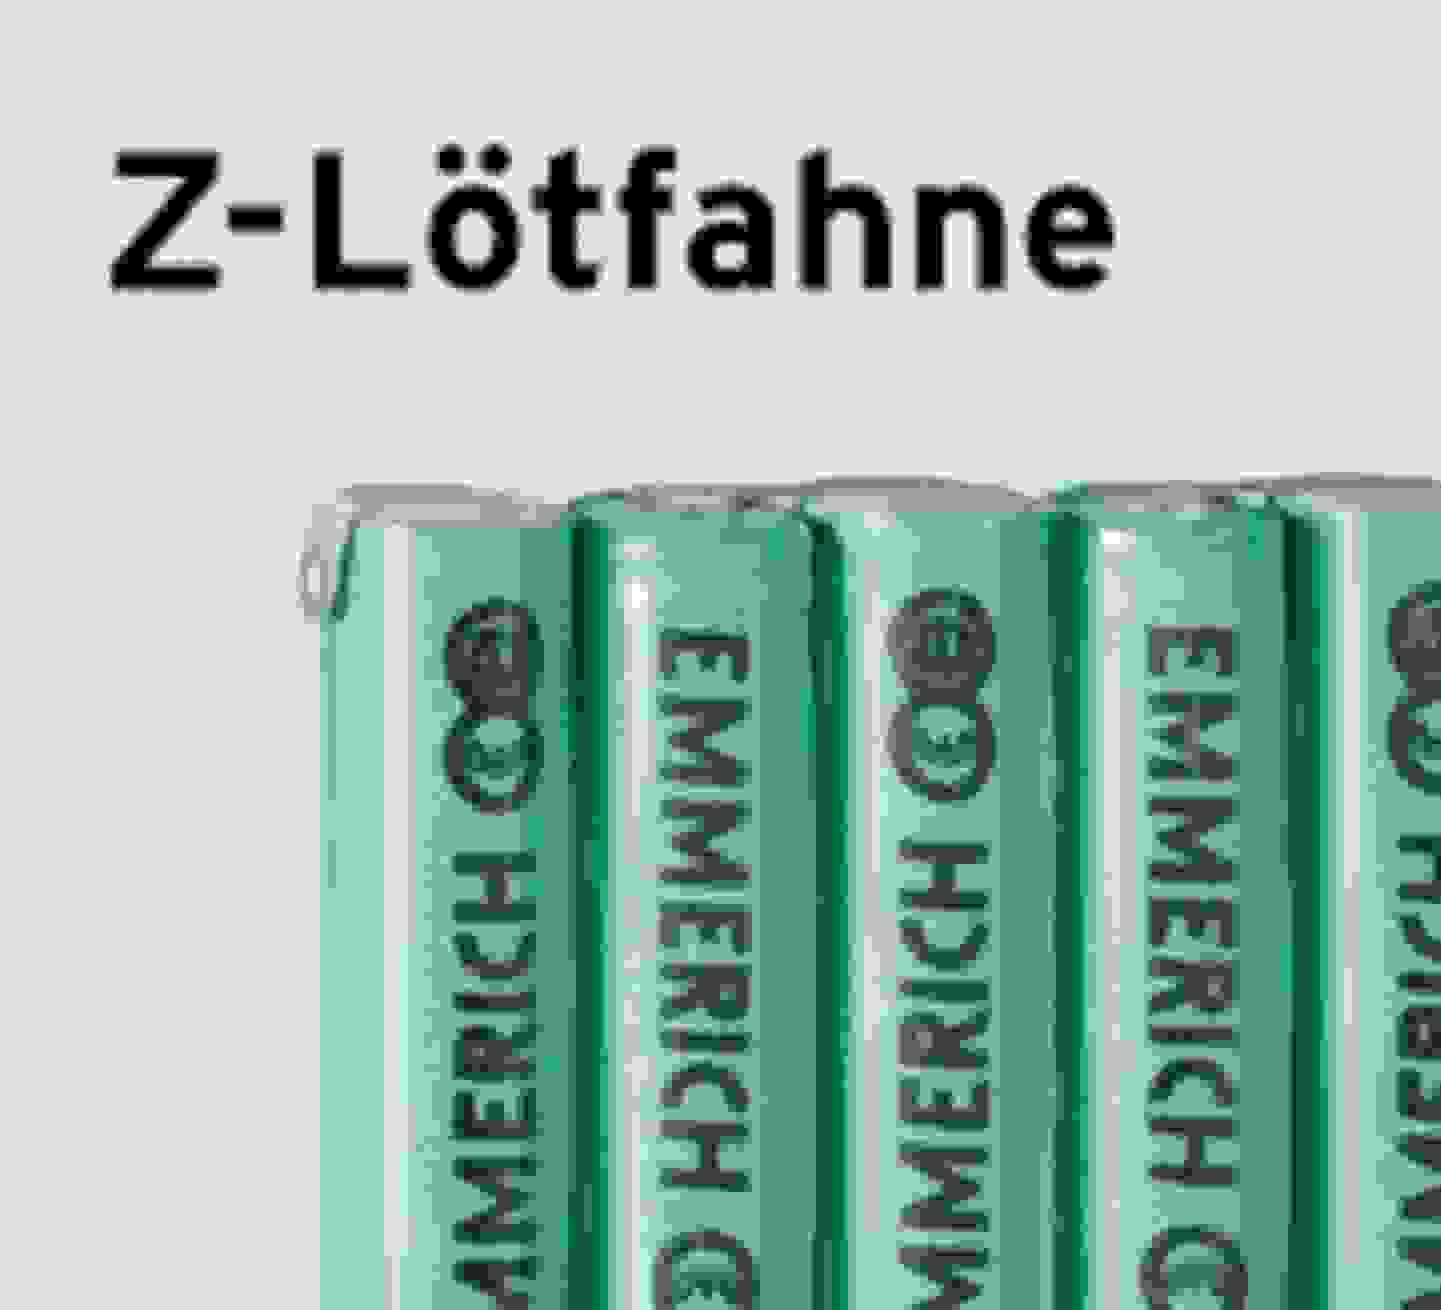 Emmerich Z-Lötfahne-Akkupacks